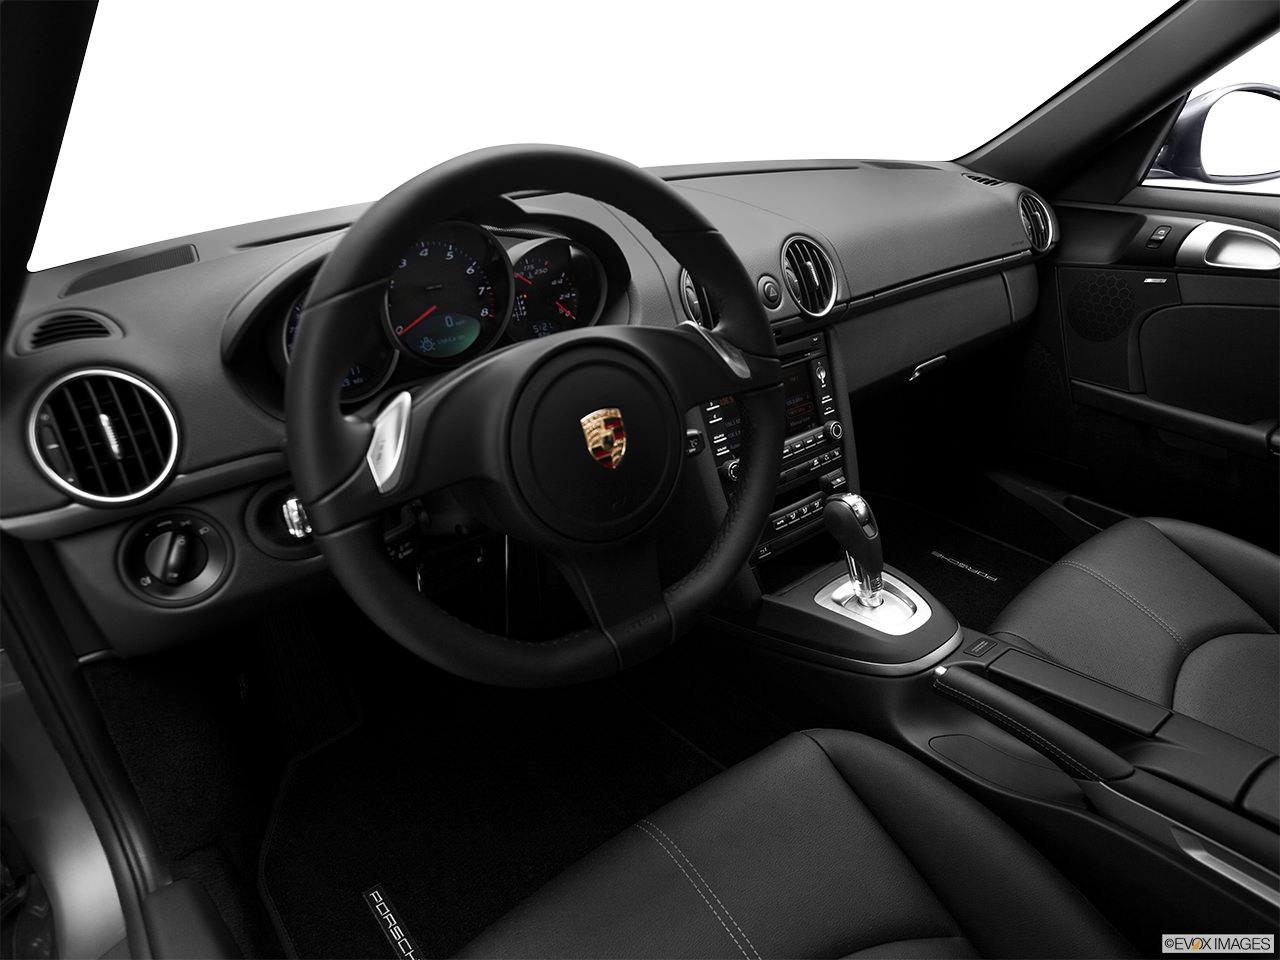 Porsche Cayman 2012 interior